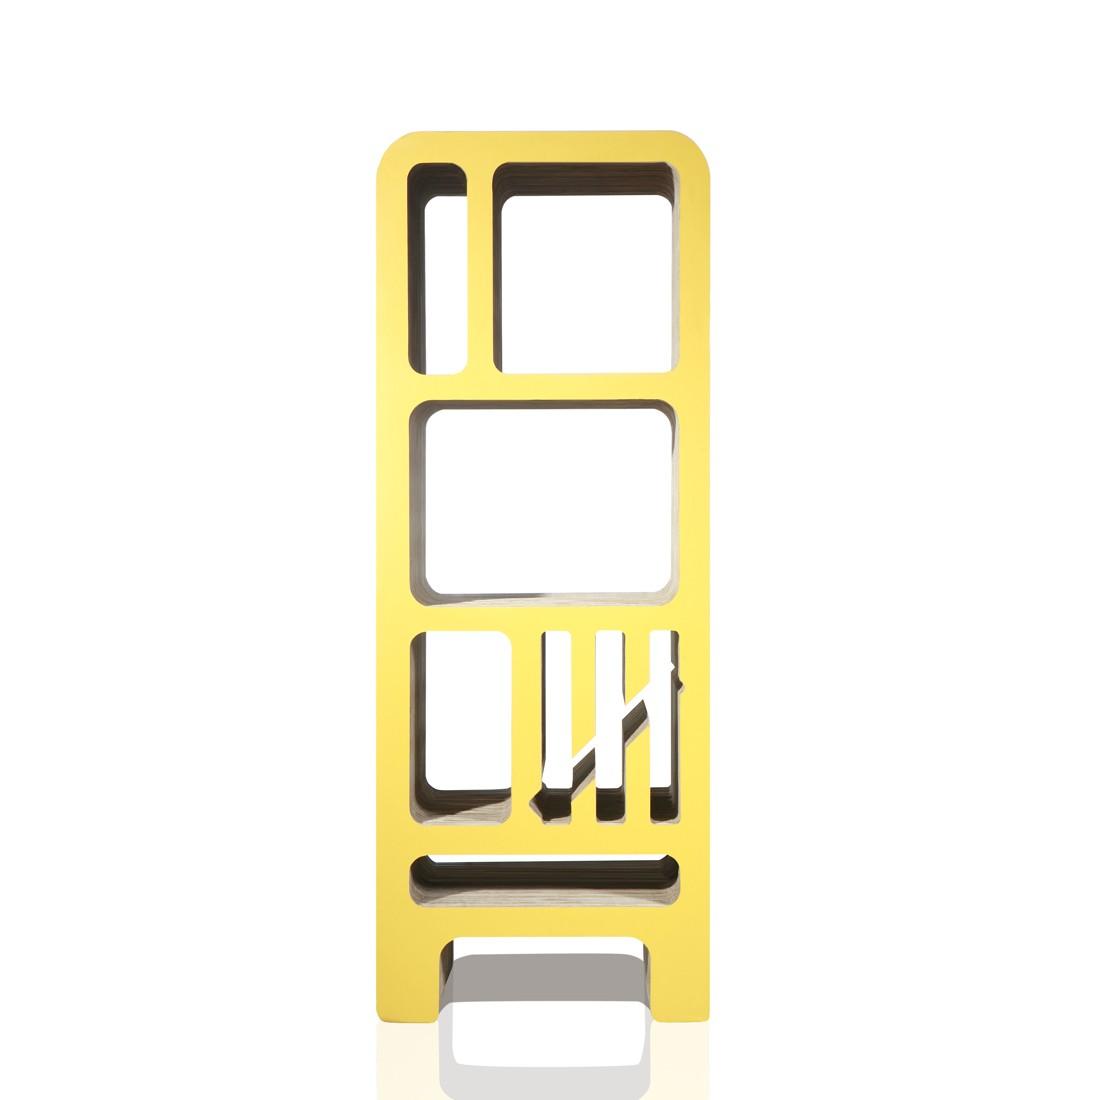 design modern cardboard furniture cardboard bookshelvescardboard furniturecardboard sideboardcontemporary bookshelvescool sideboardscreative modern cardboard furniture for your ecofriendly room design